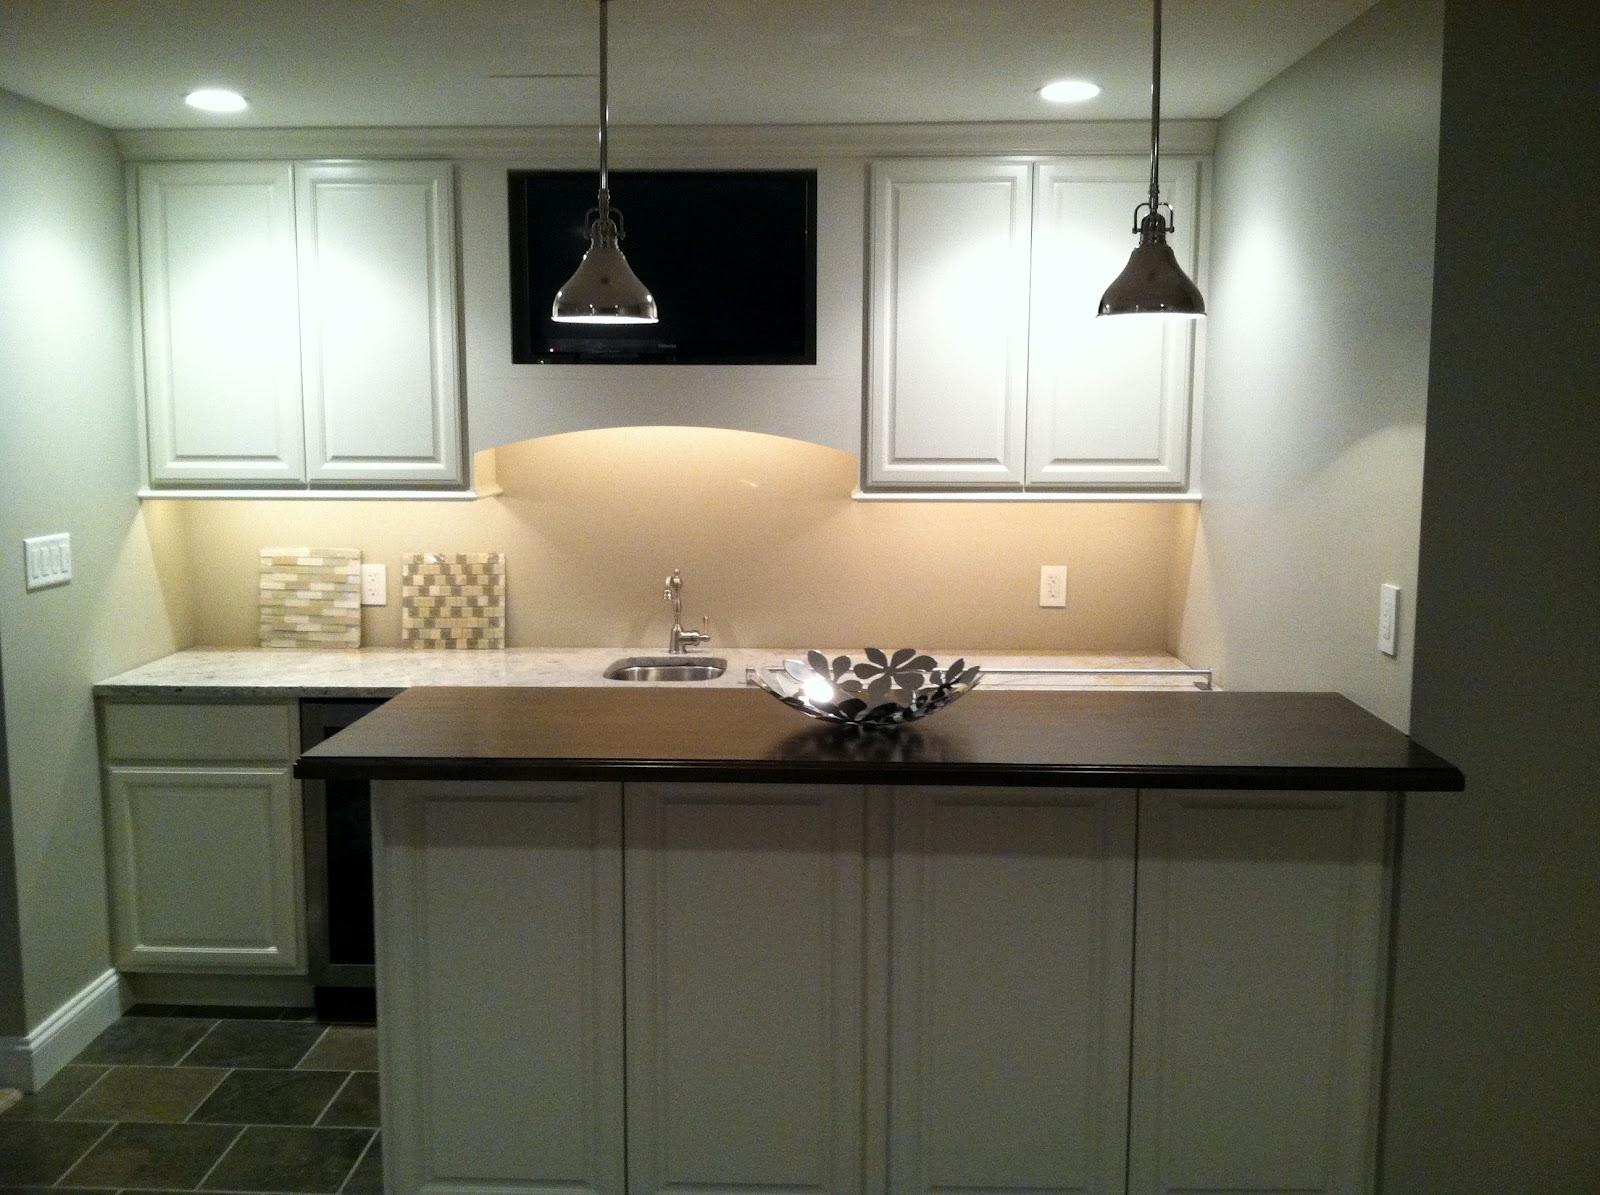 Ikea Kitchen Counters Refurbish Cabinets Numerar Island Countertop  Nazarm